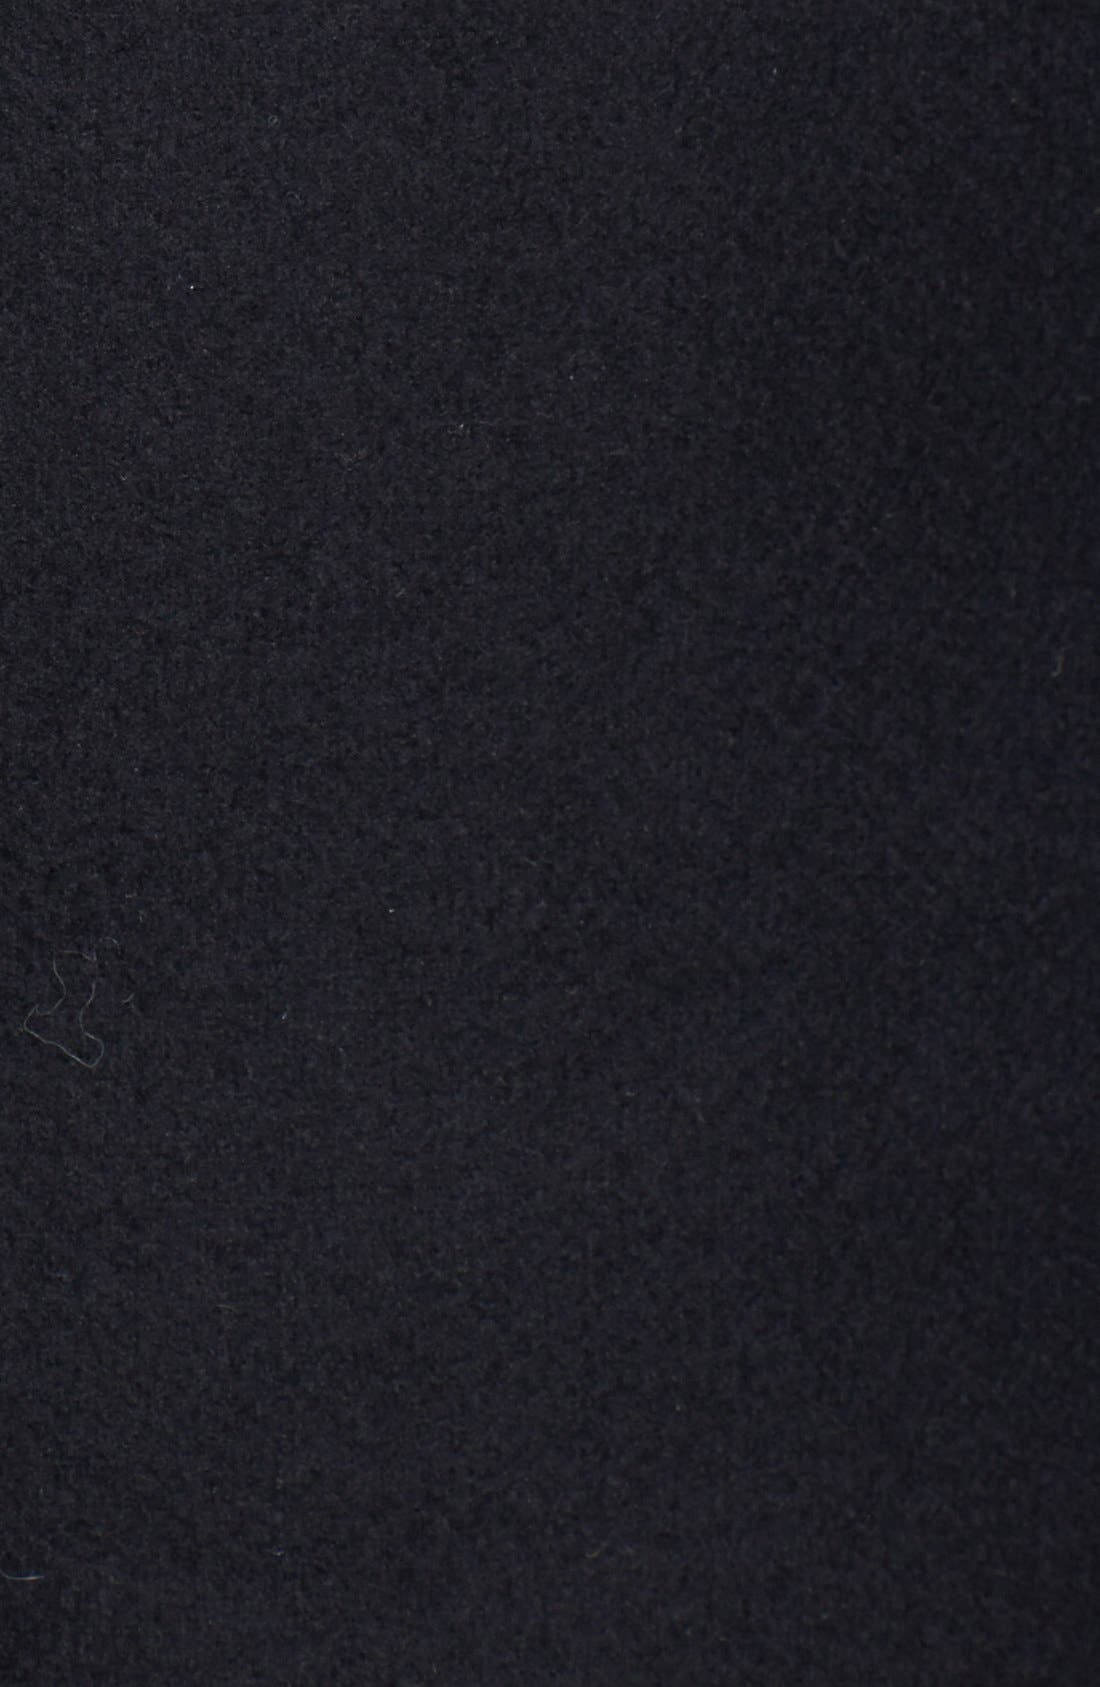 Alternate Image 3  - Theory 'Gazella' Wool Blend Walking Coat